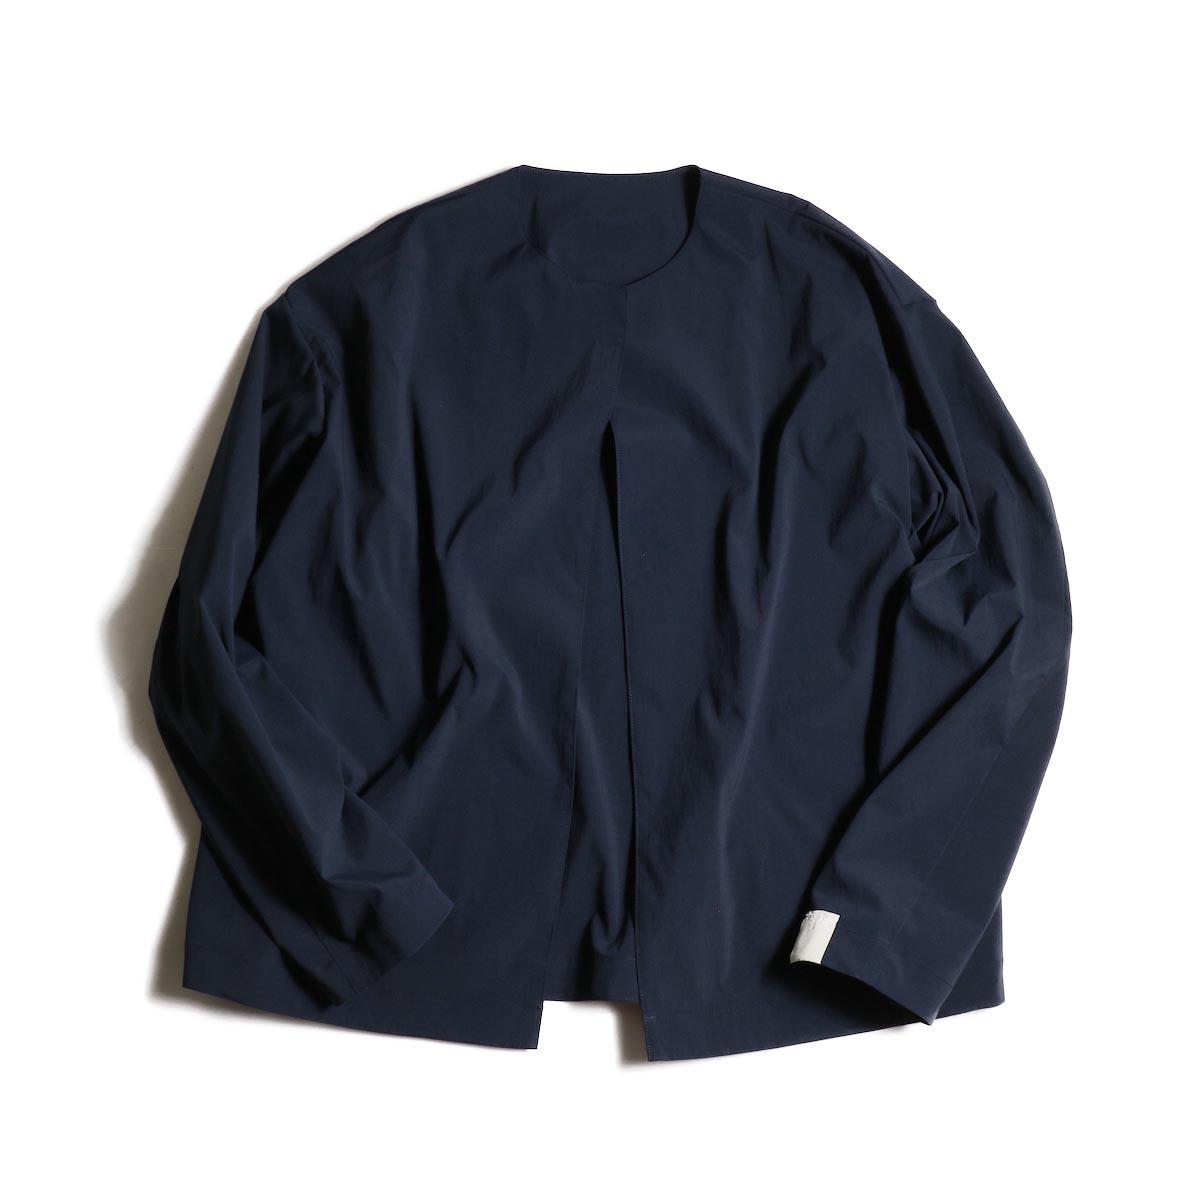 N.HOOLYWOOD / 1202-BL03-007 Collarless Jacket (Navy)